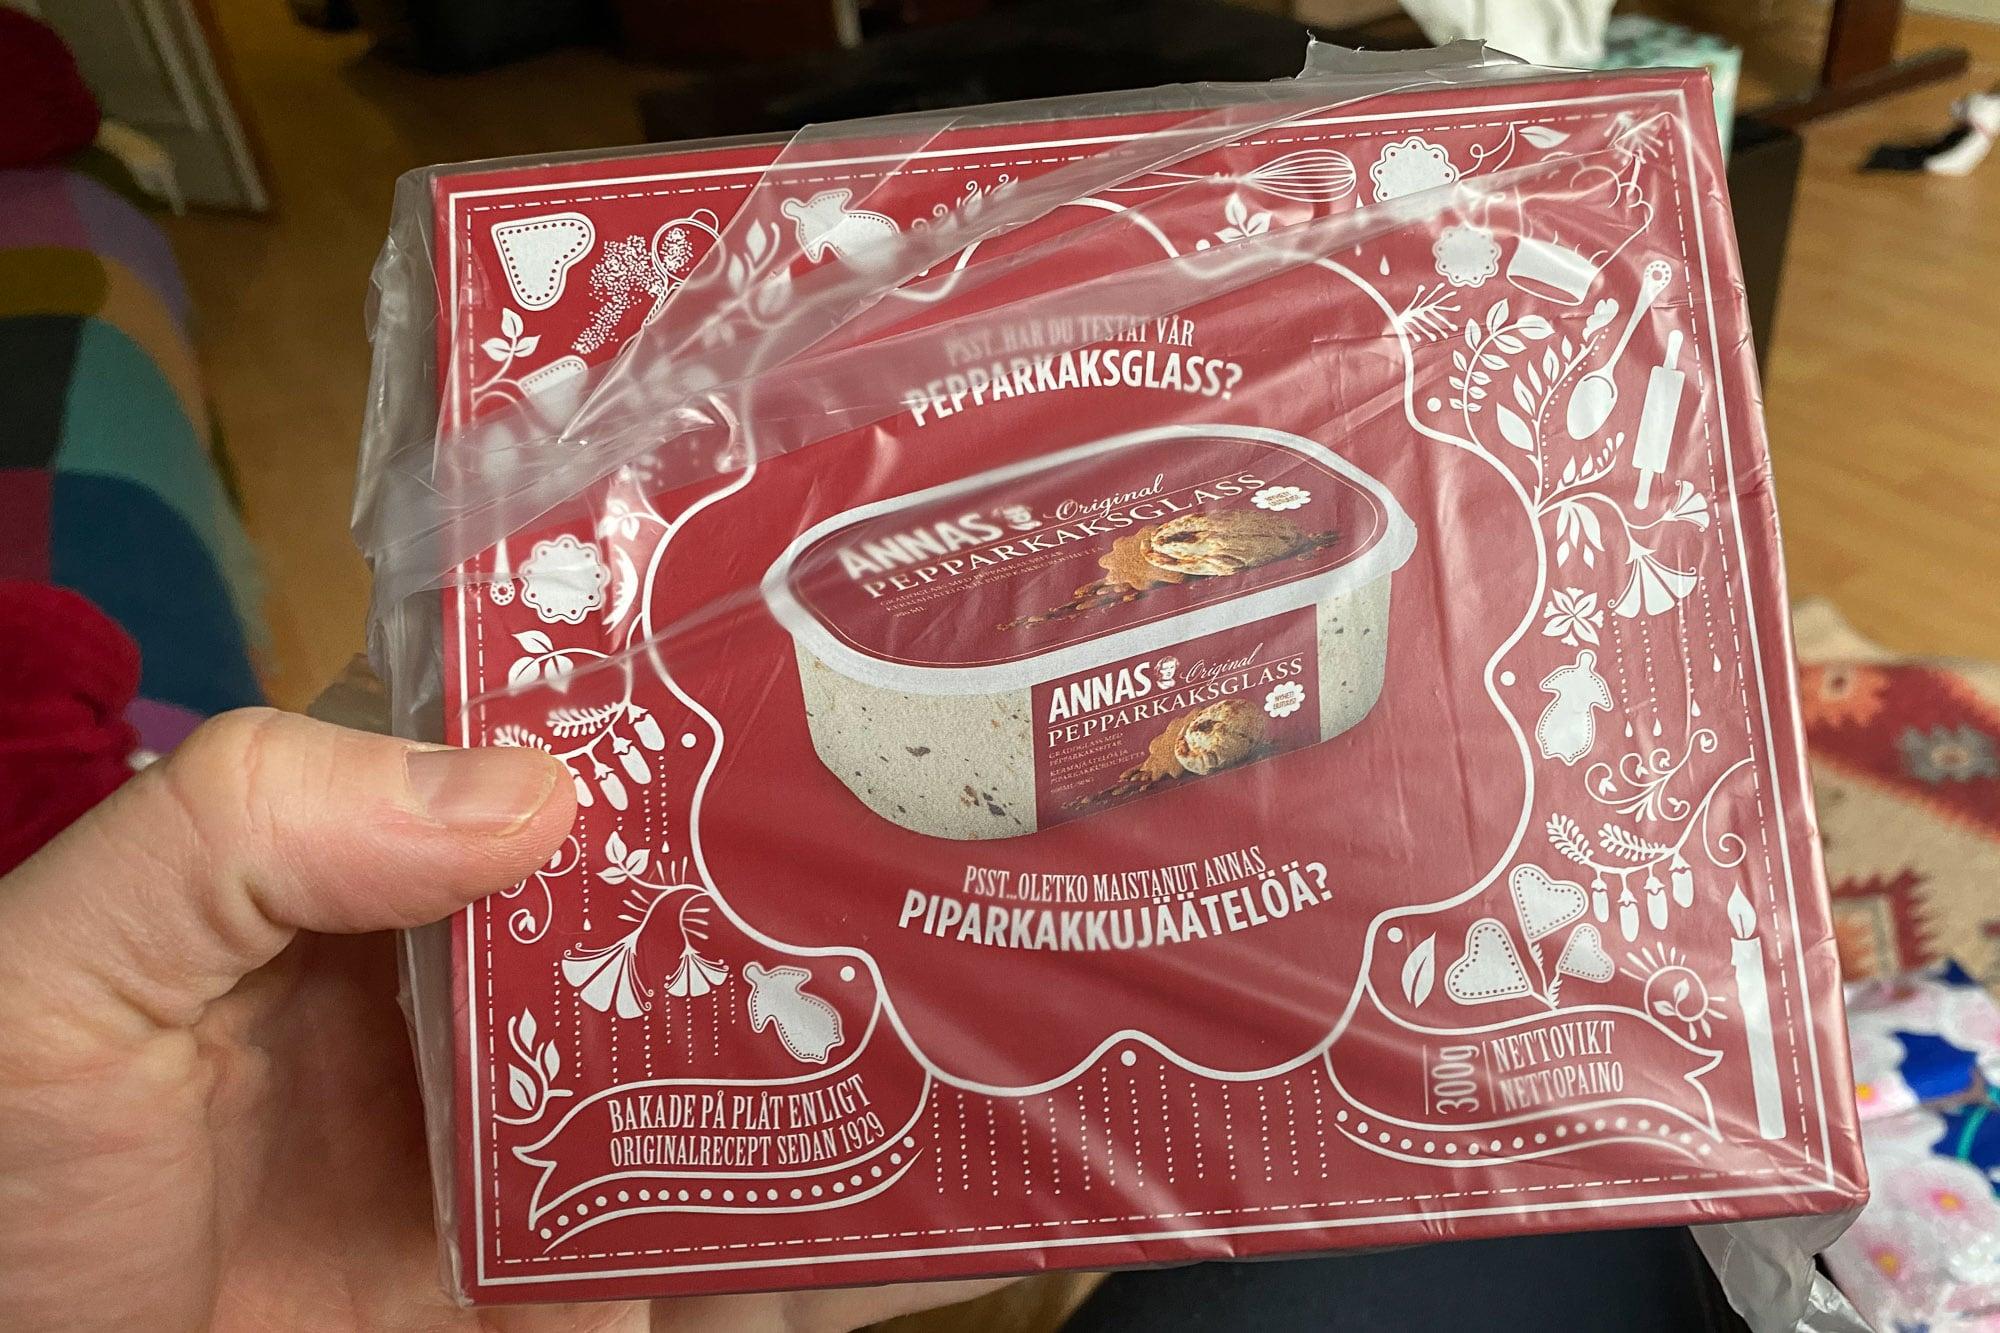 Swedish cookies from Hannah